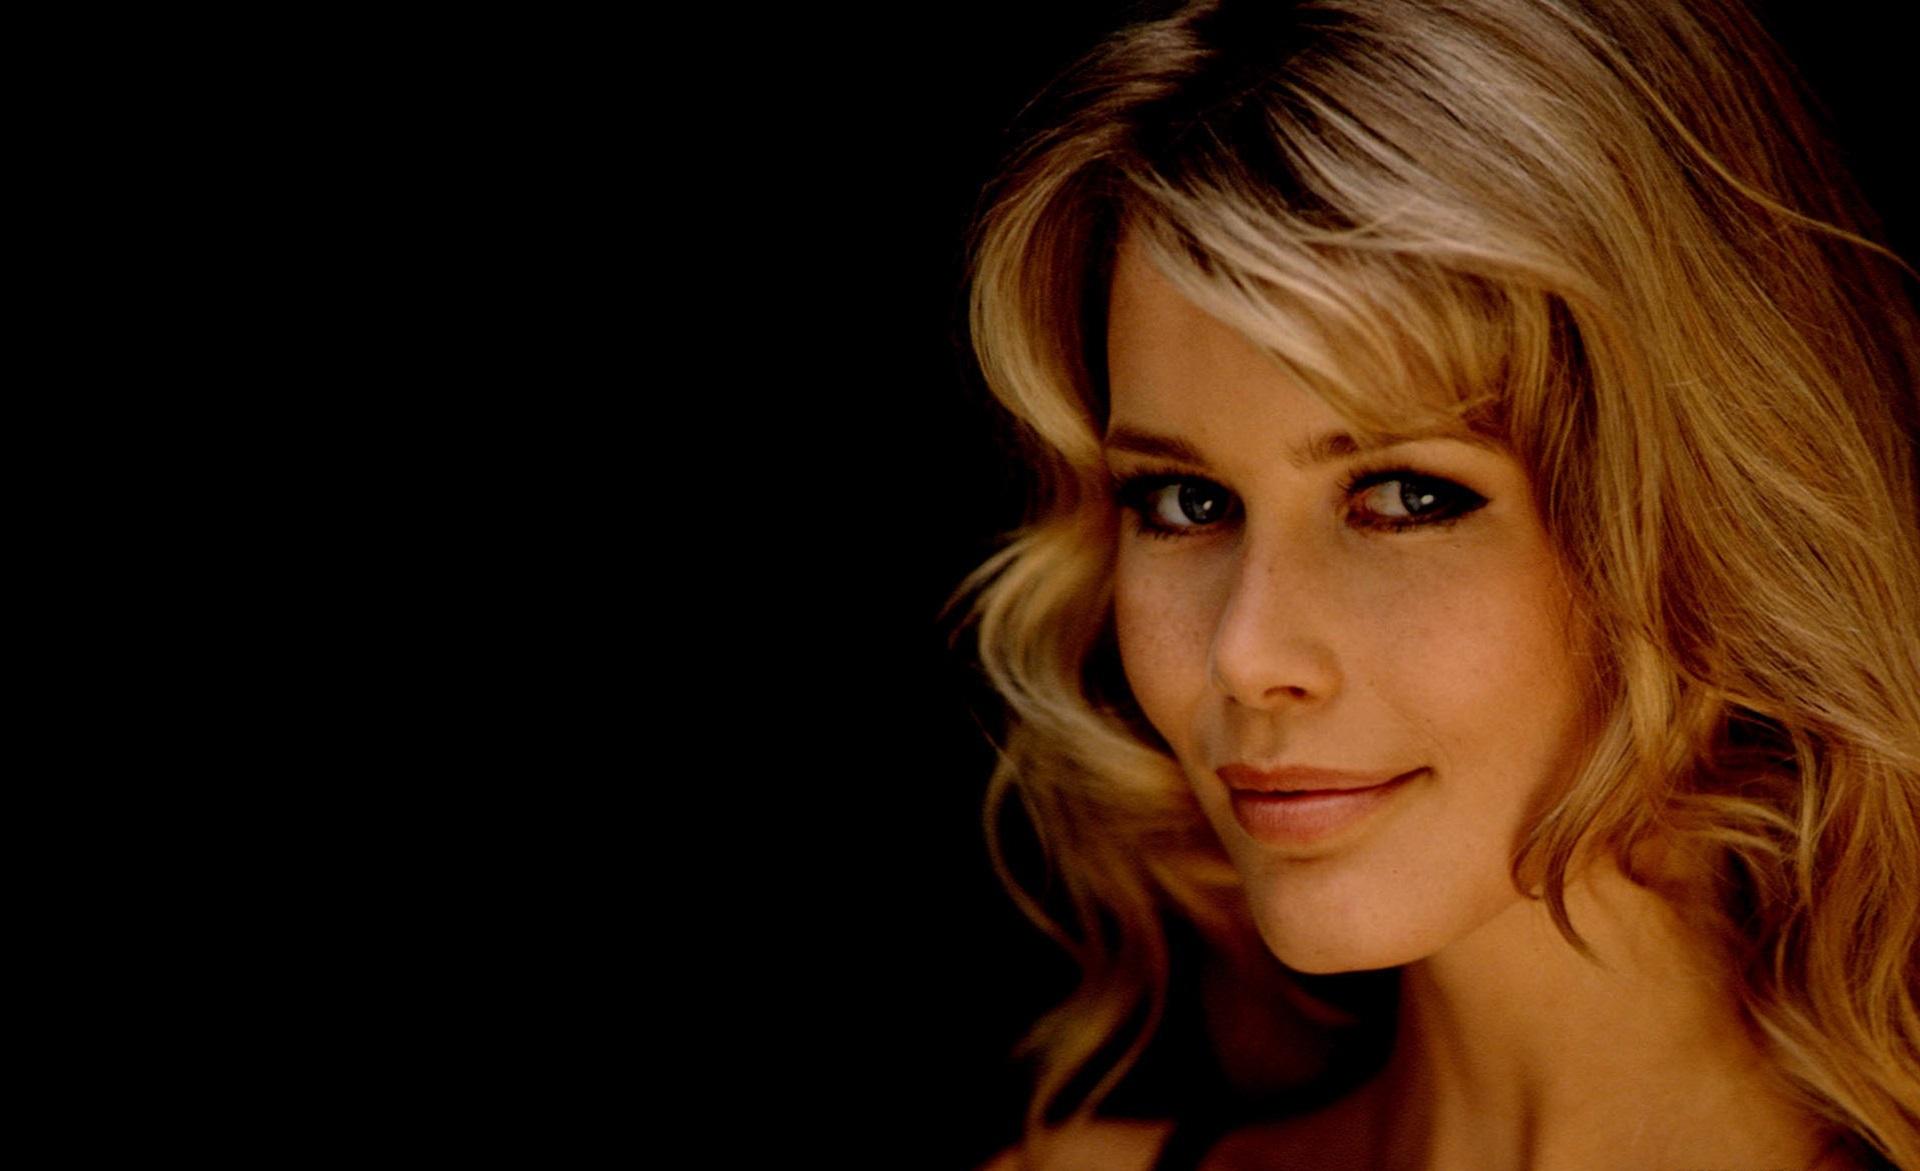 Claudia Schiffer Background